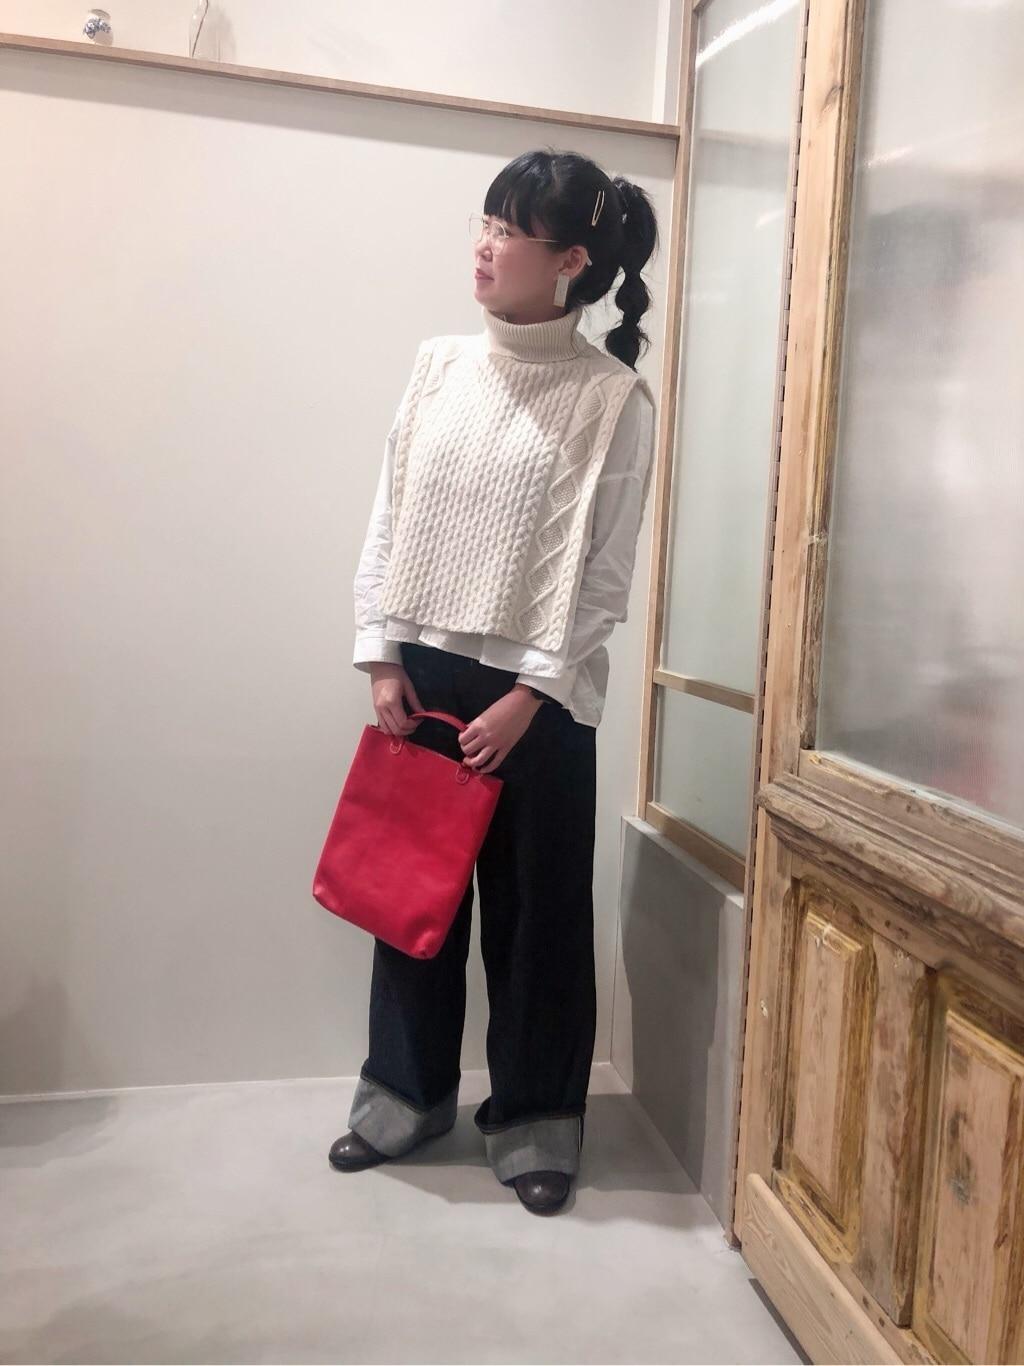 bulle de savon 渋谷スクランブルスクエア 身長:157cm 2020.01.10